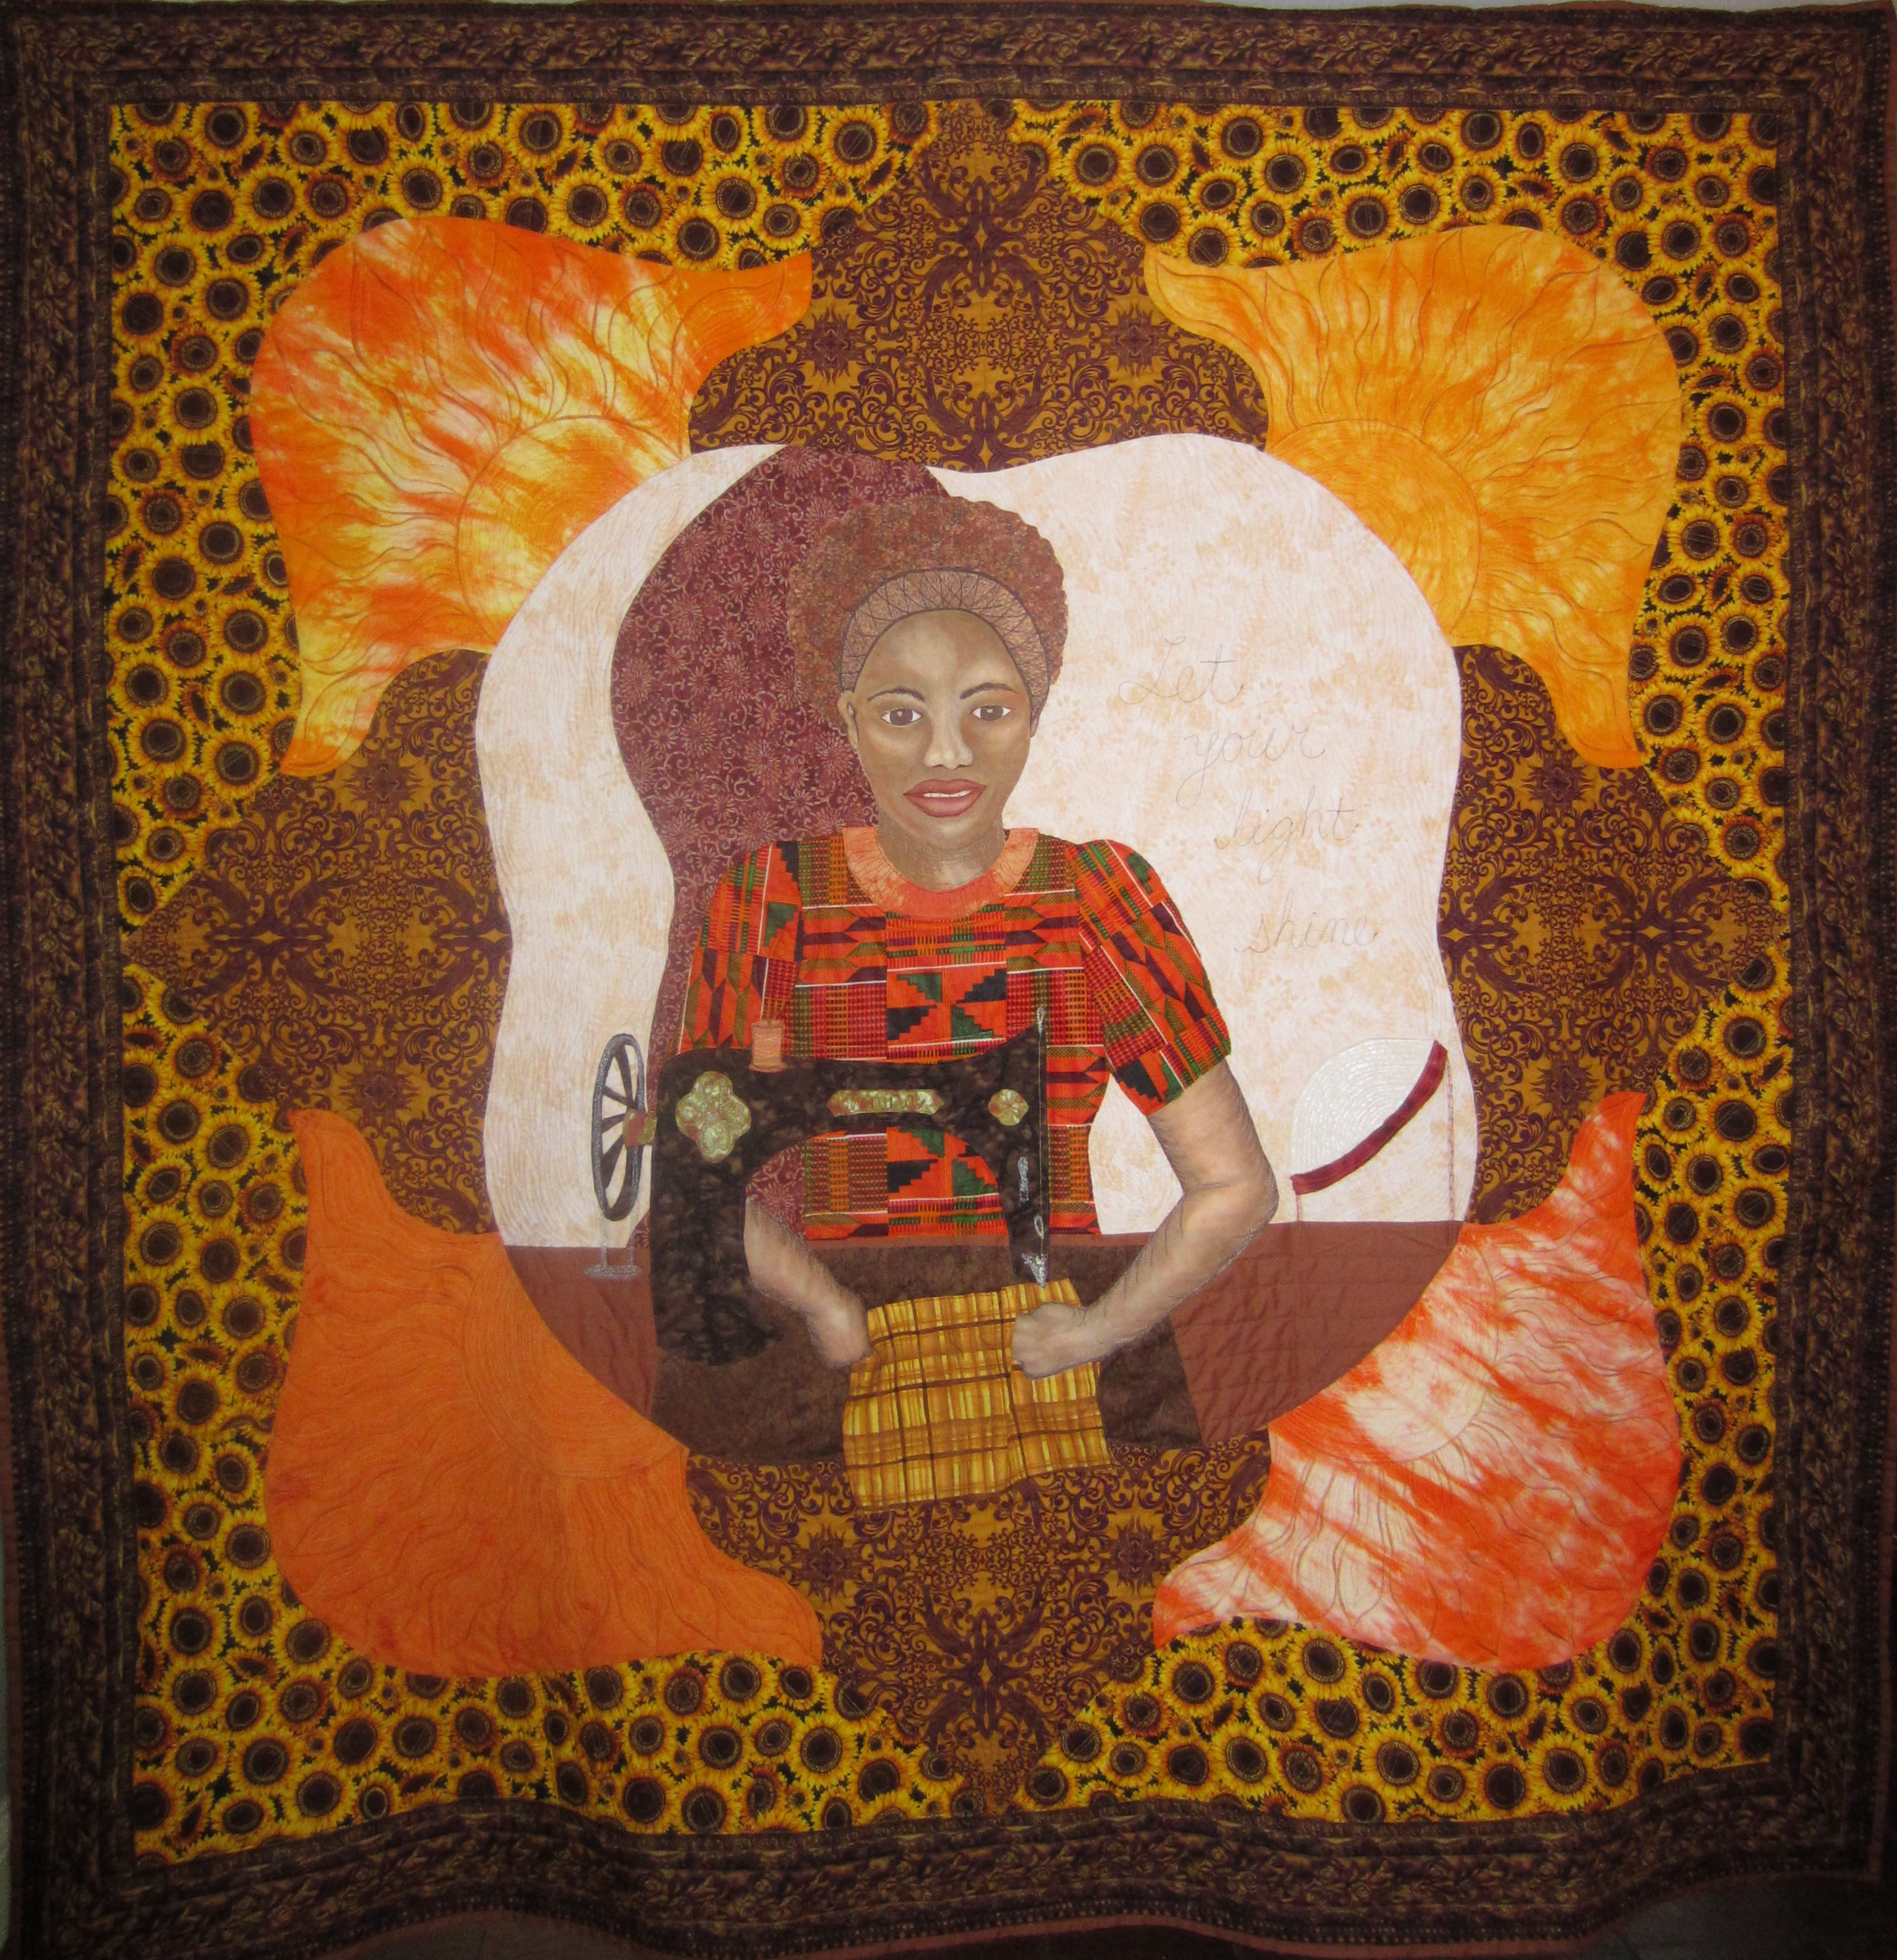 Sewing Sister by Allison WIlbur, Barrington Rhode Island